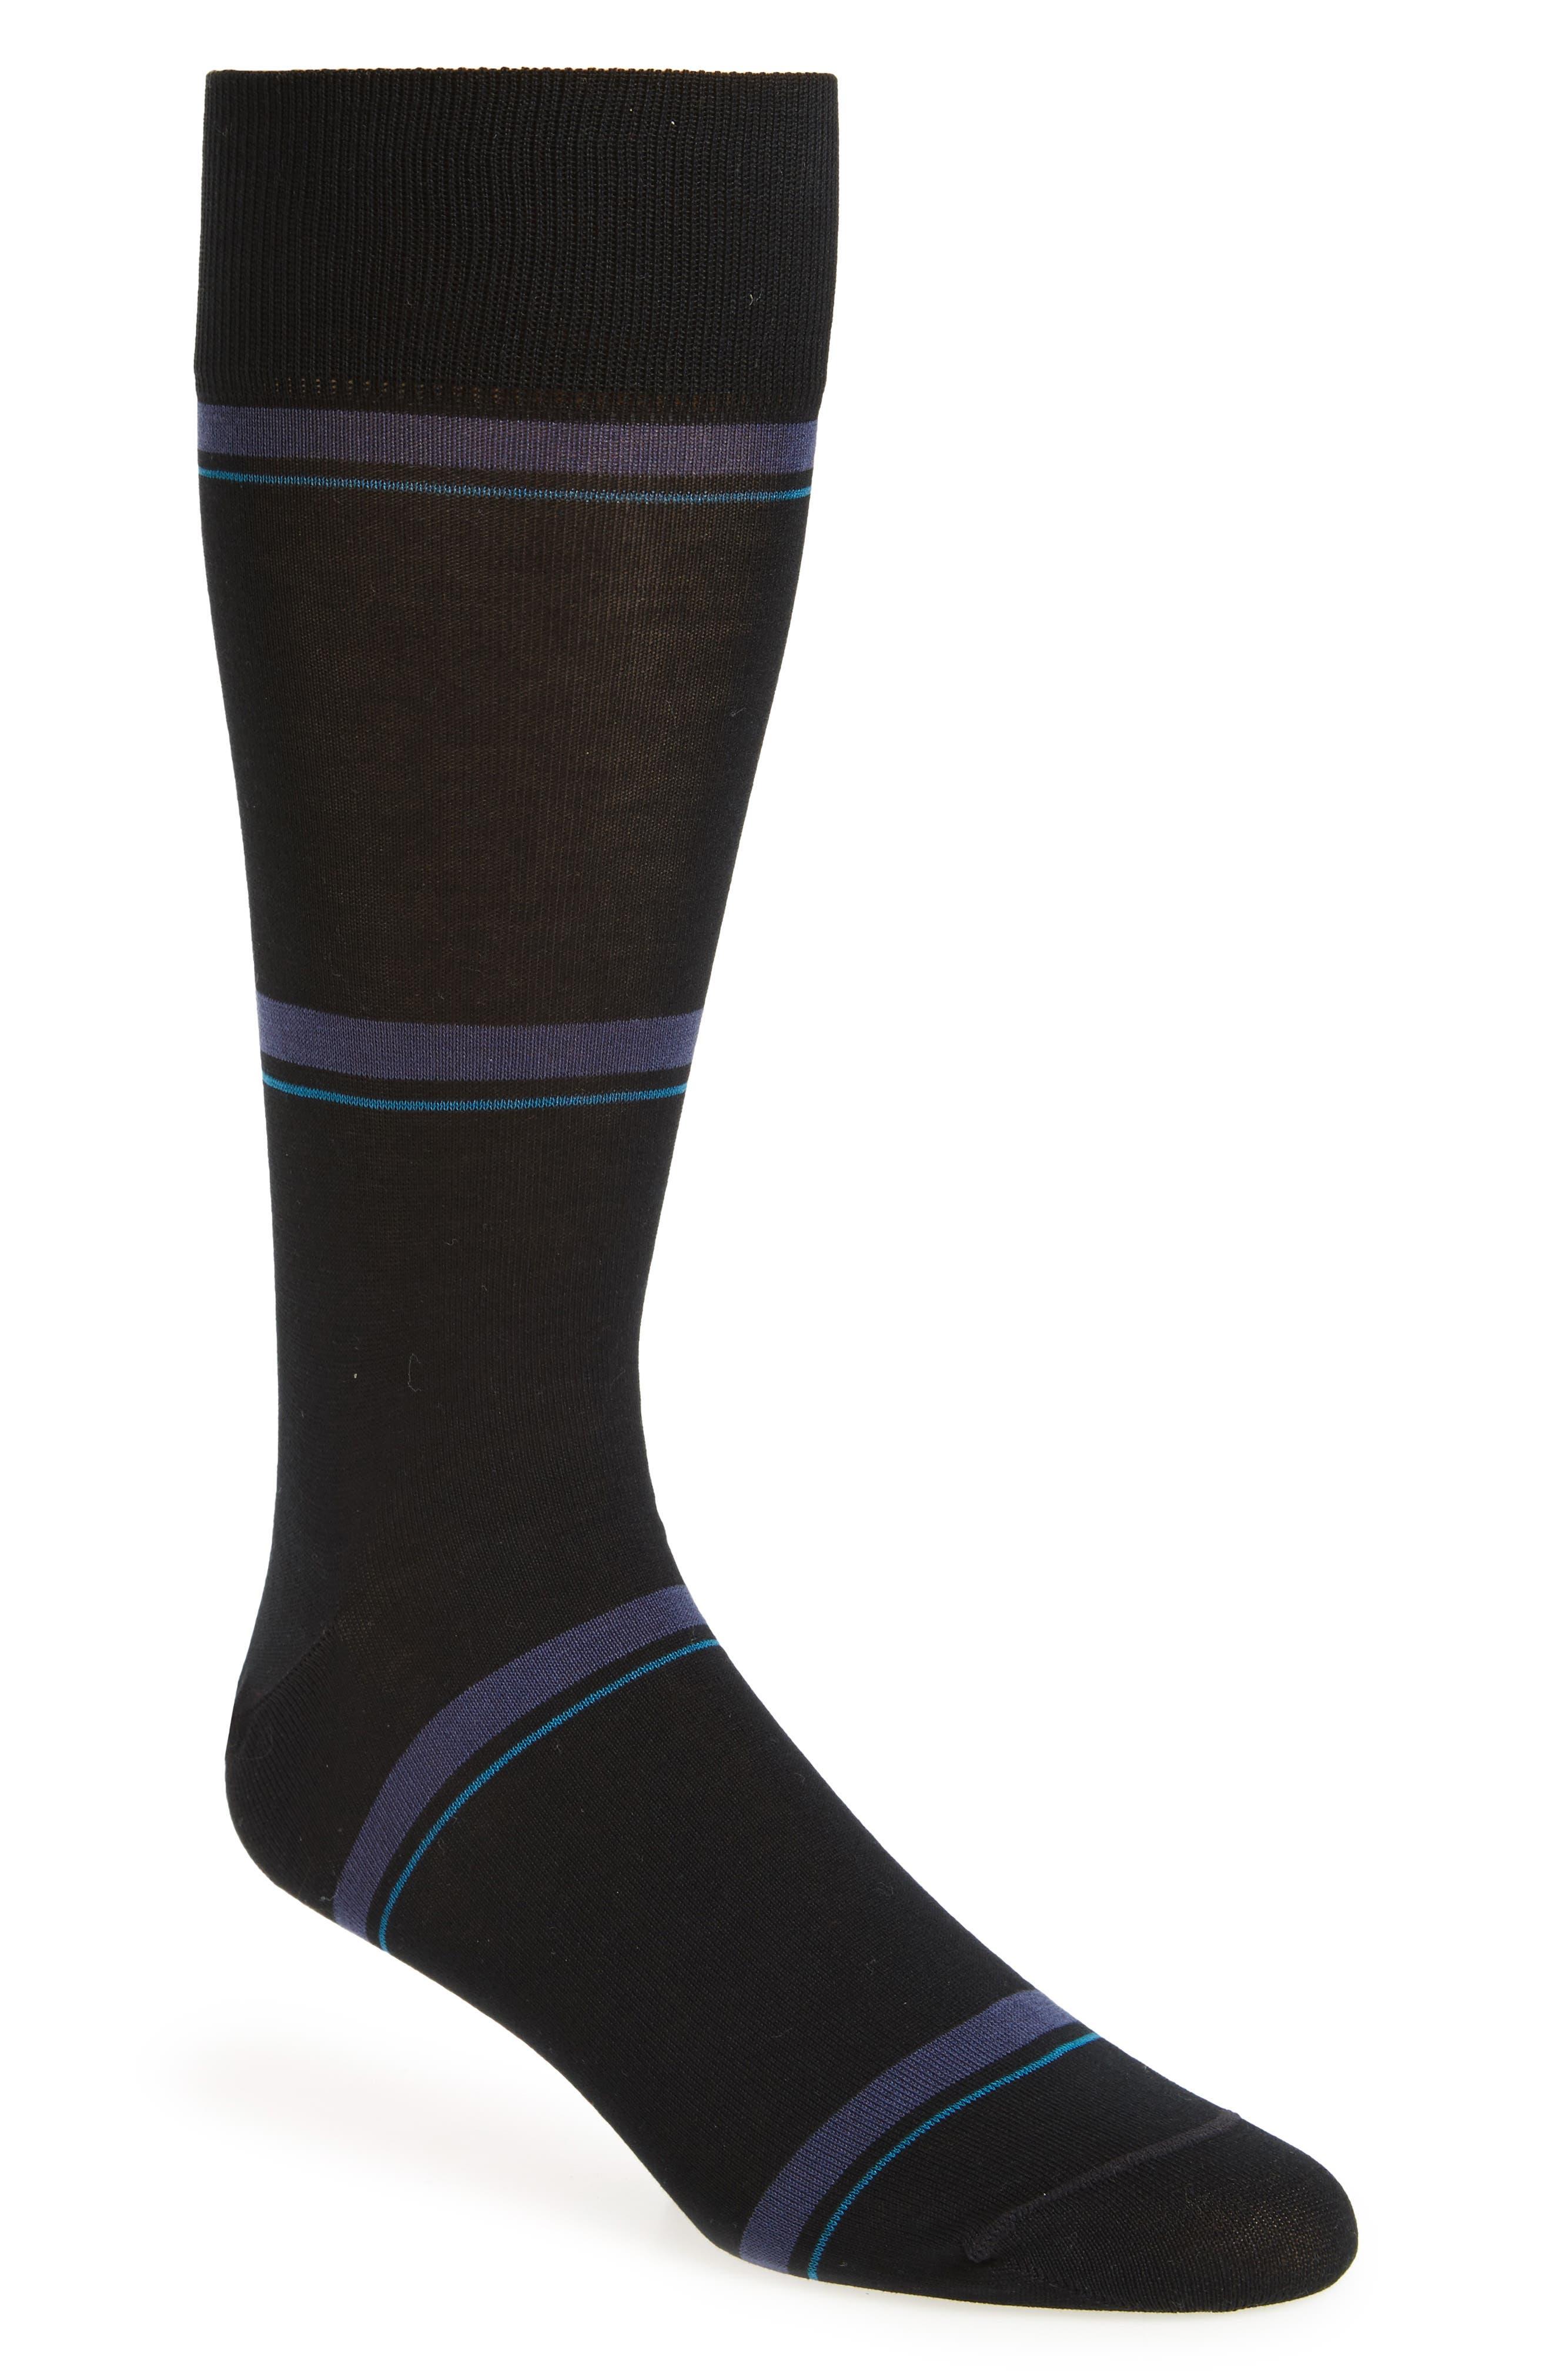 Double Banded Socks,                         Main,                         color, Black/ Blue